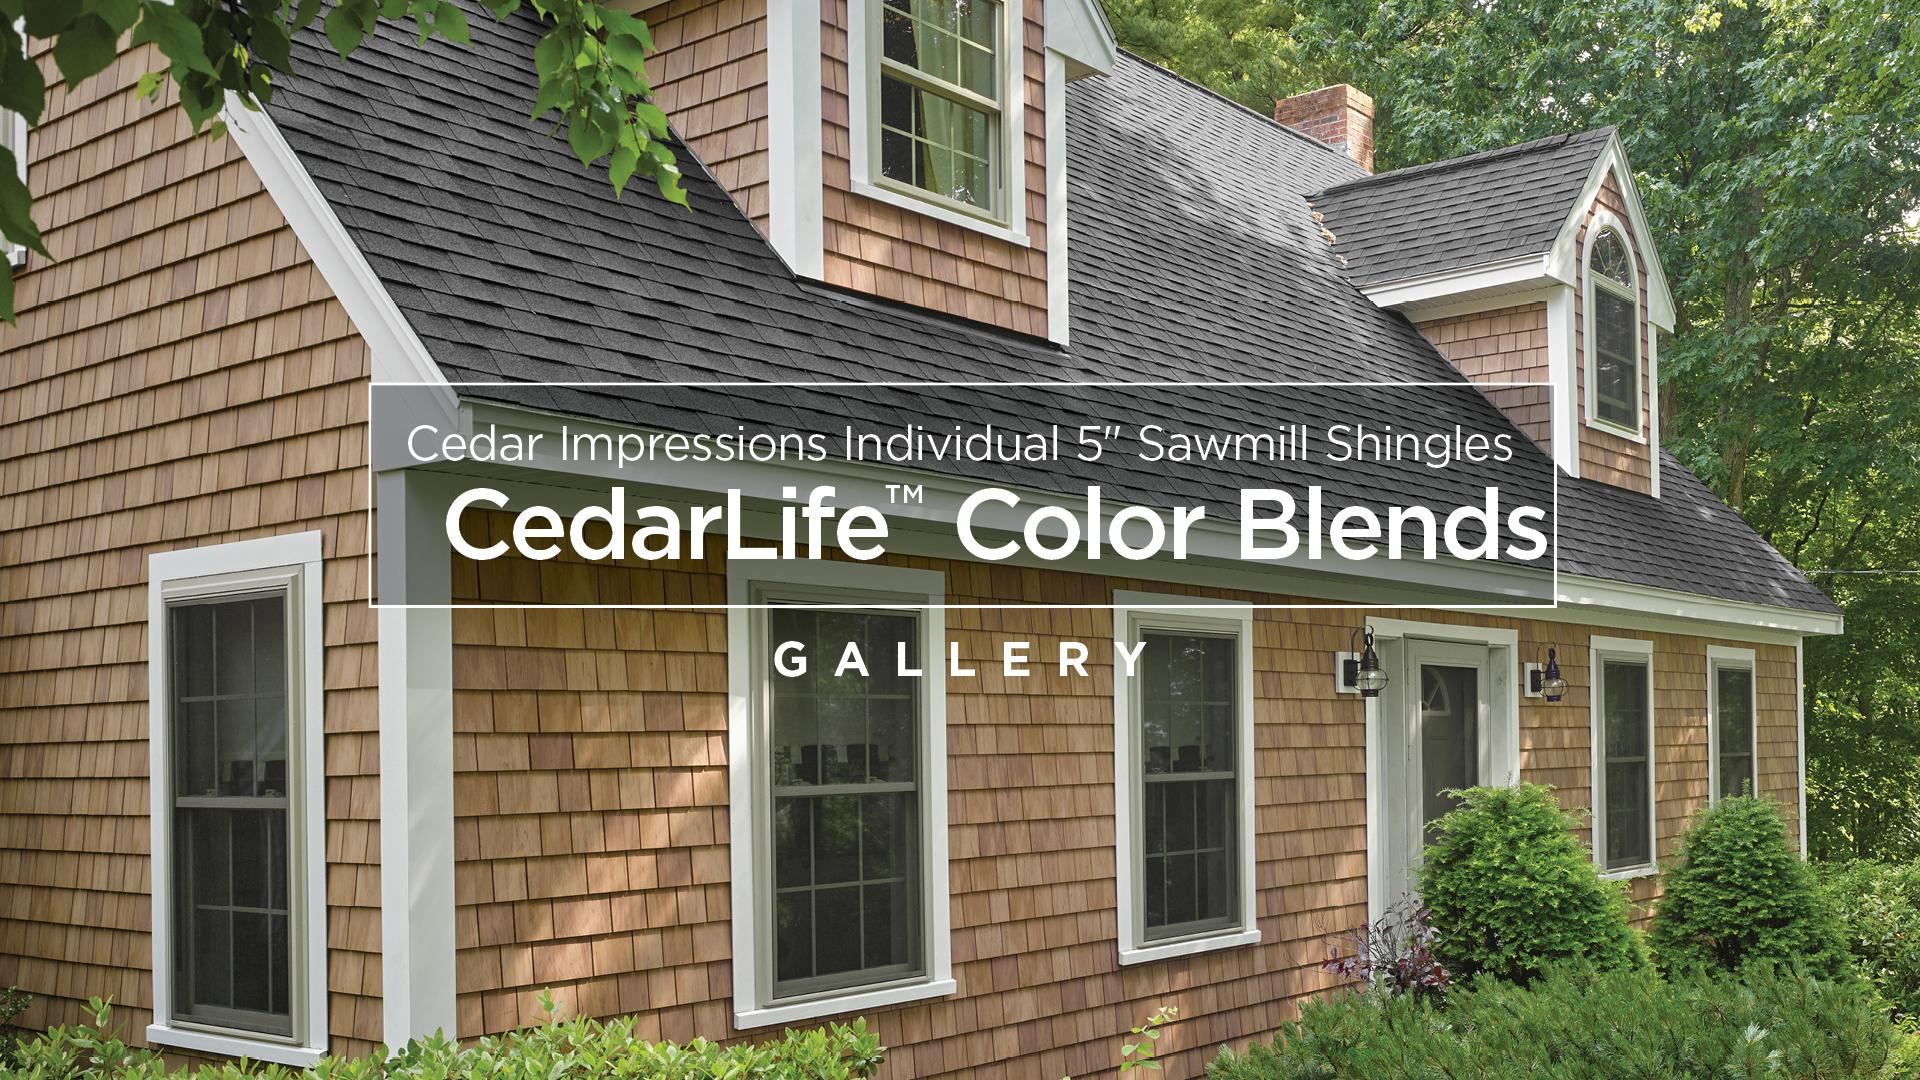 Cedar Impressions Individual 5 Quot Sawmill Shingles